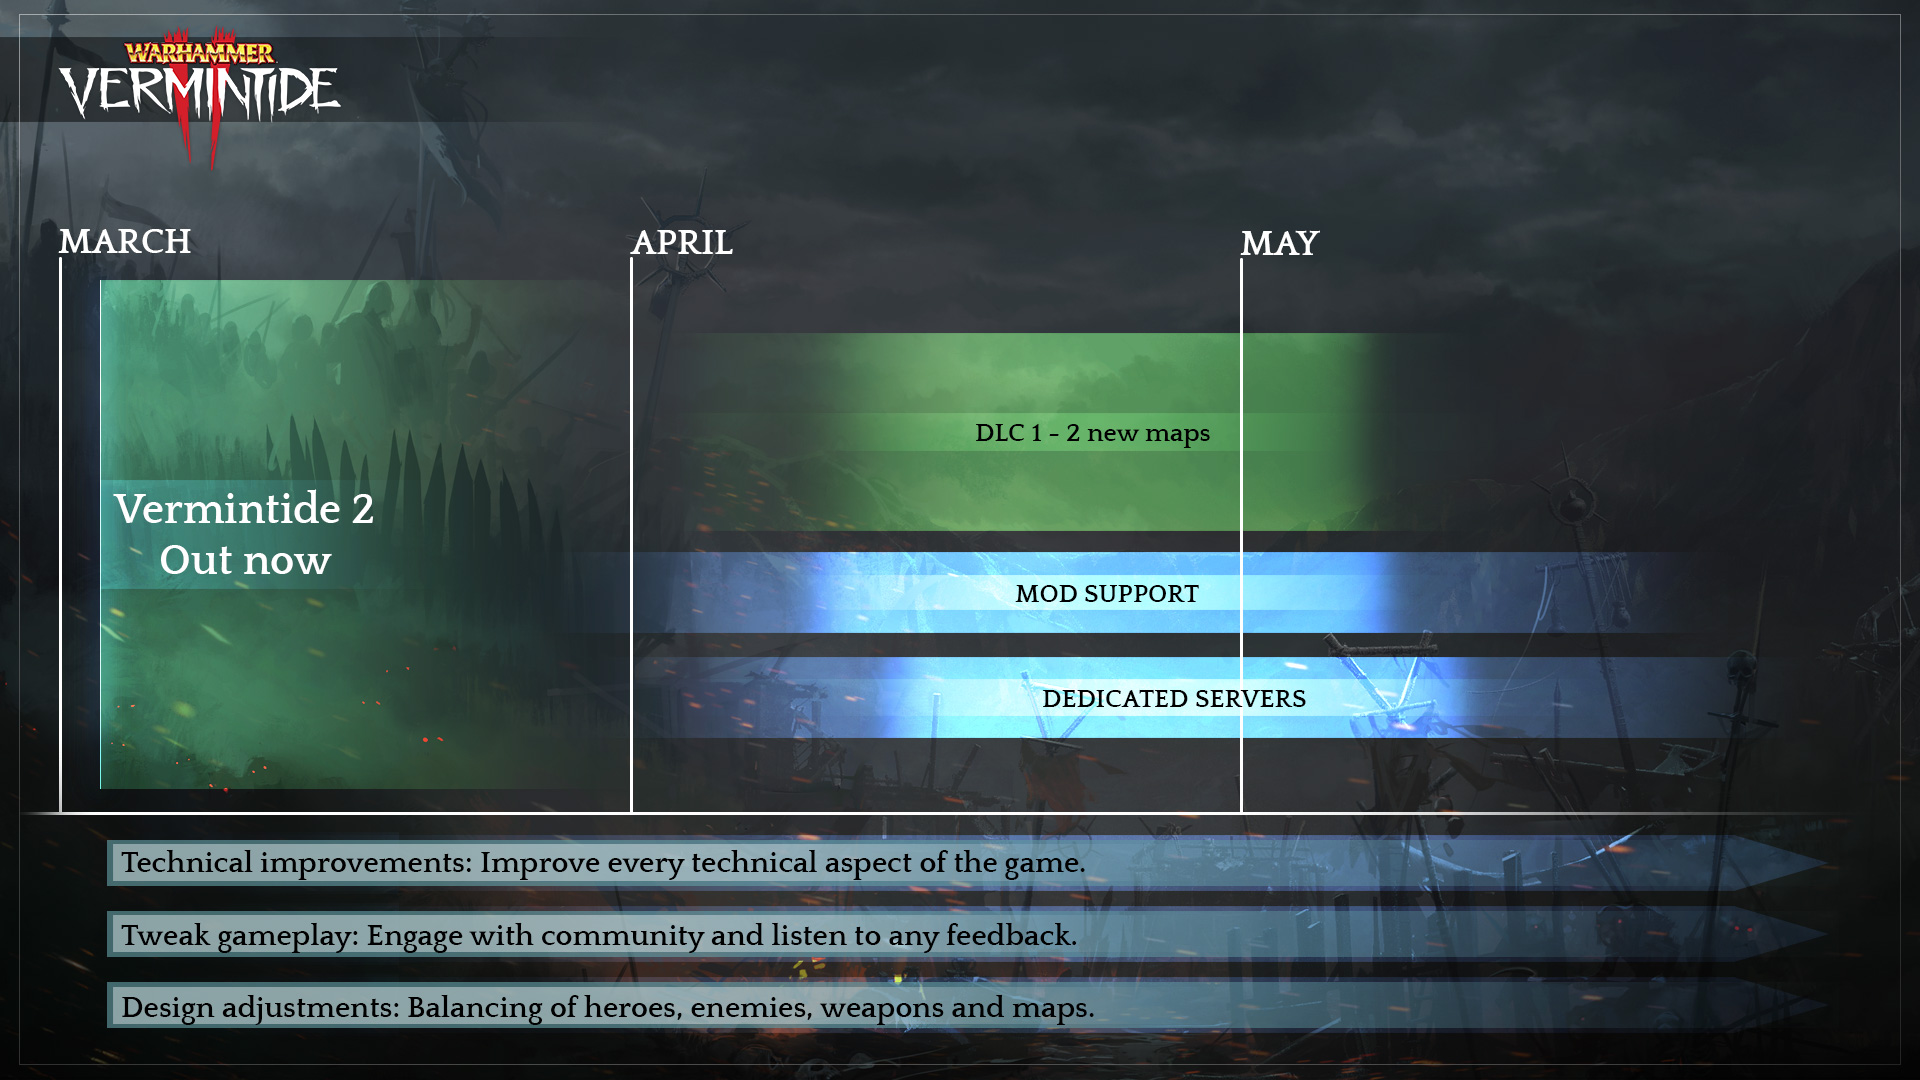 Warhammer Vermintide 2 roadmap